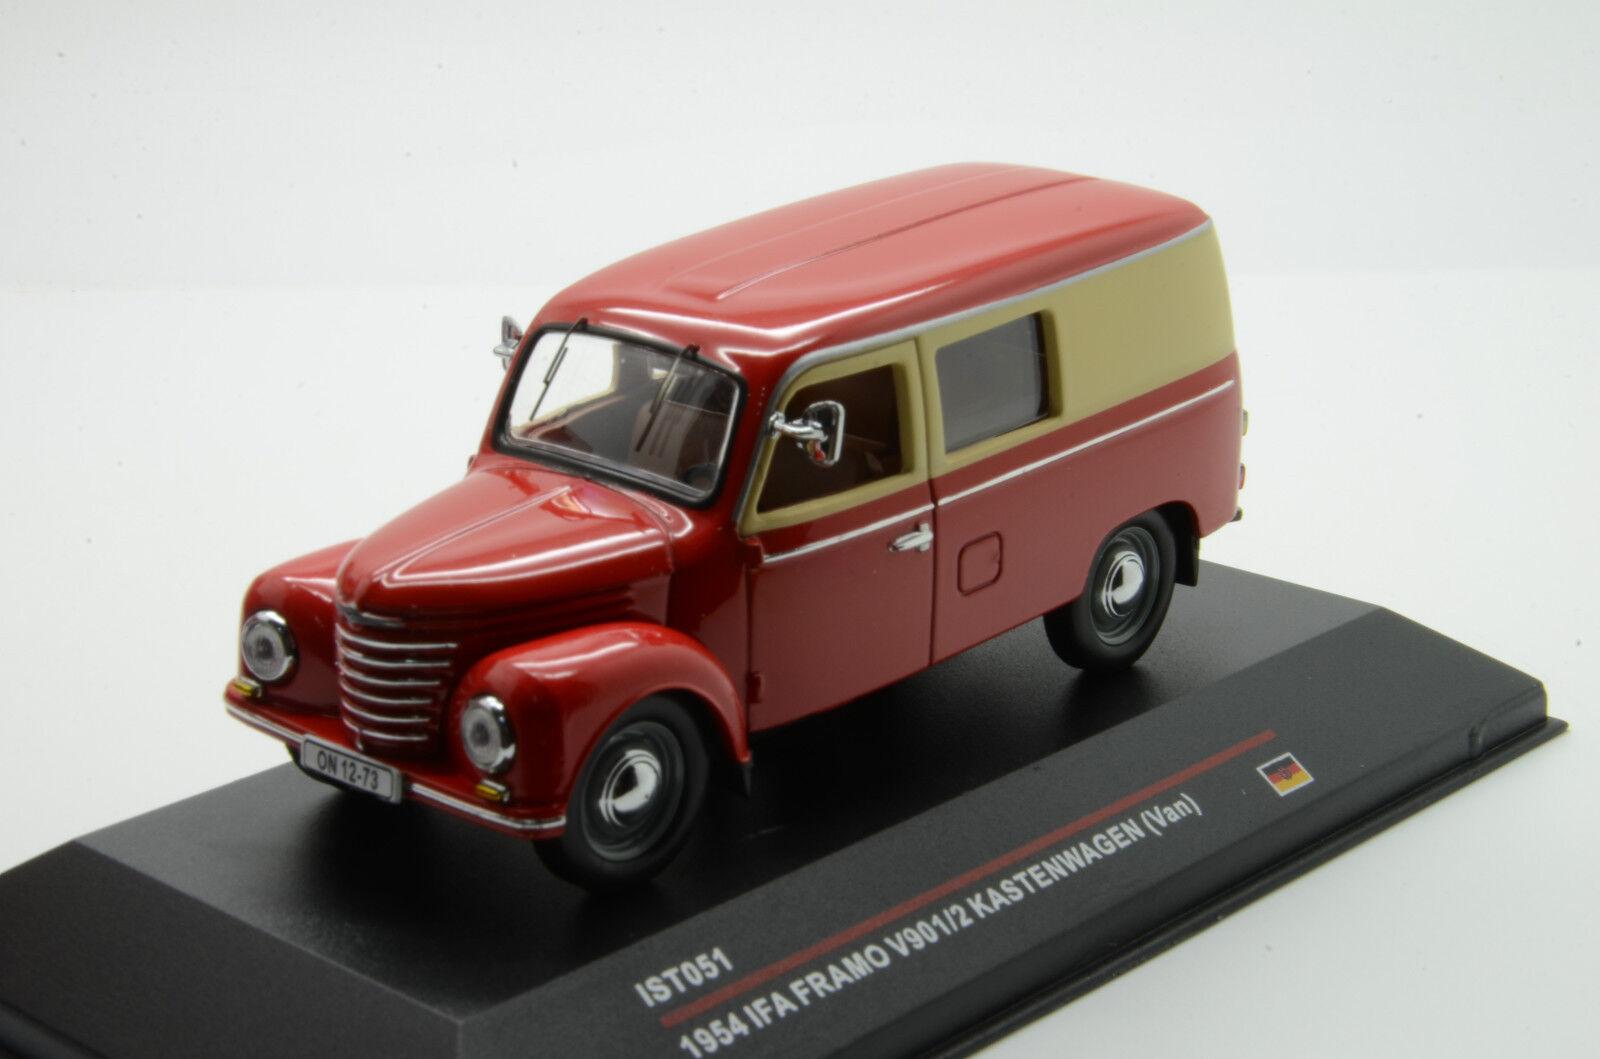 Ifa Framo V901 2 Kastenwagen 1954 IST 051 1 43